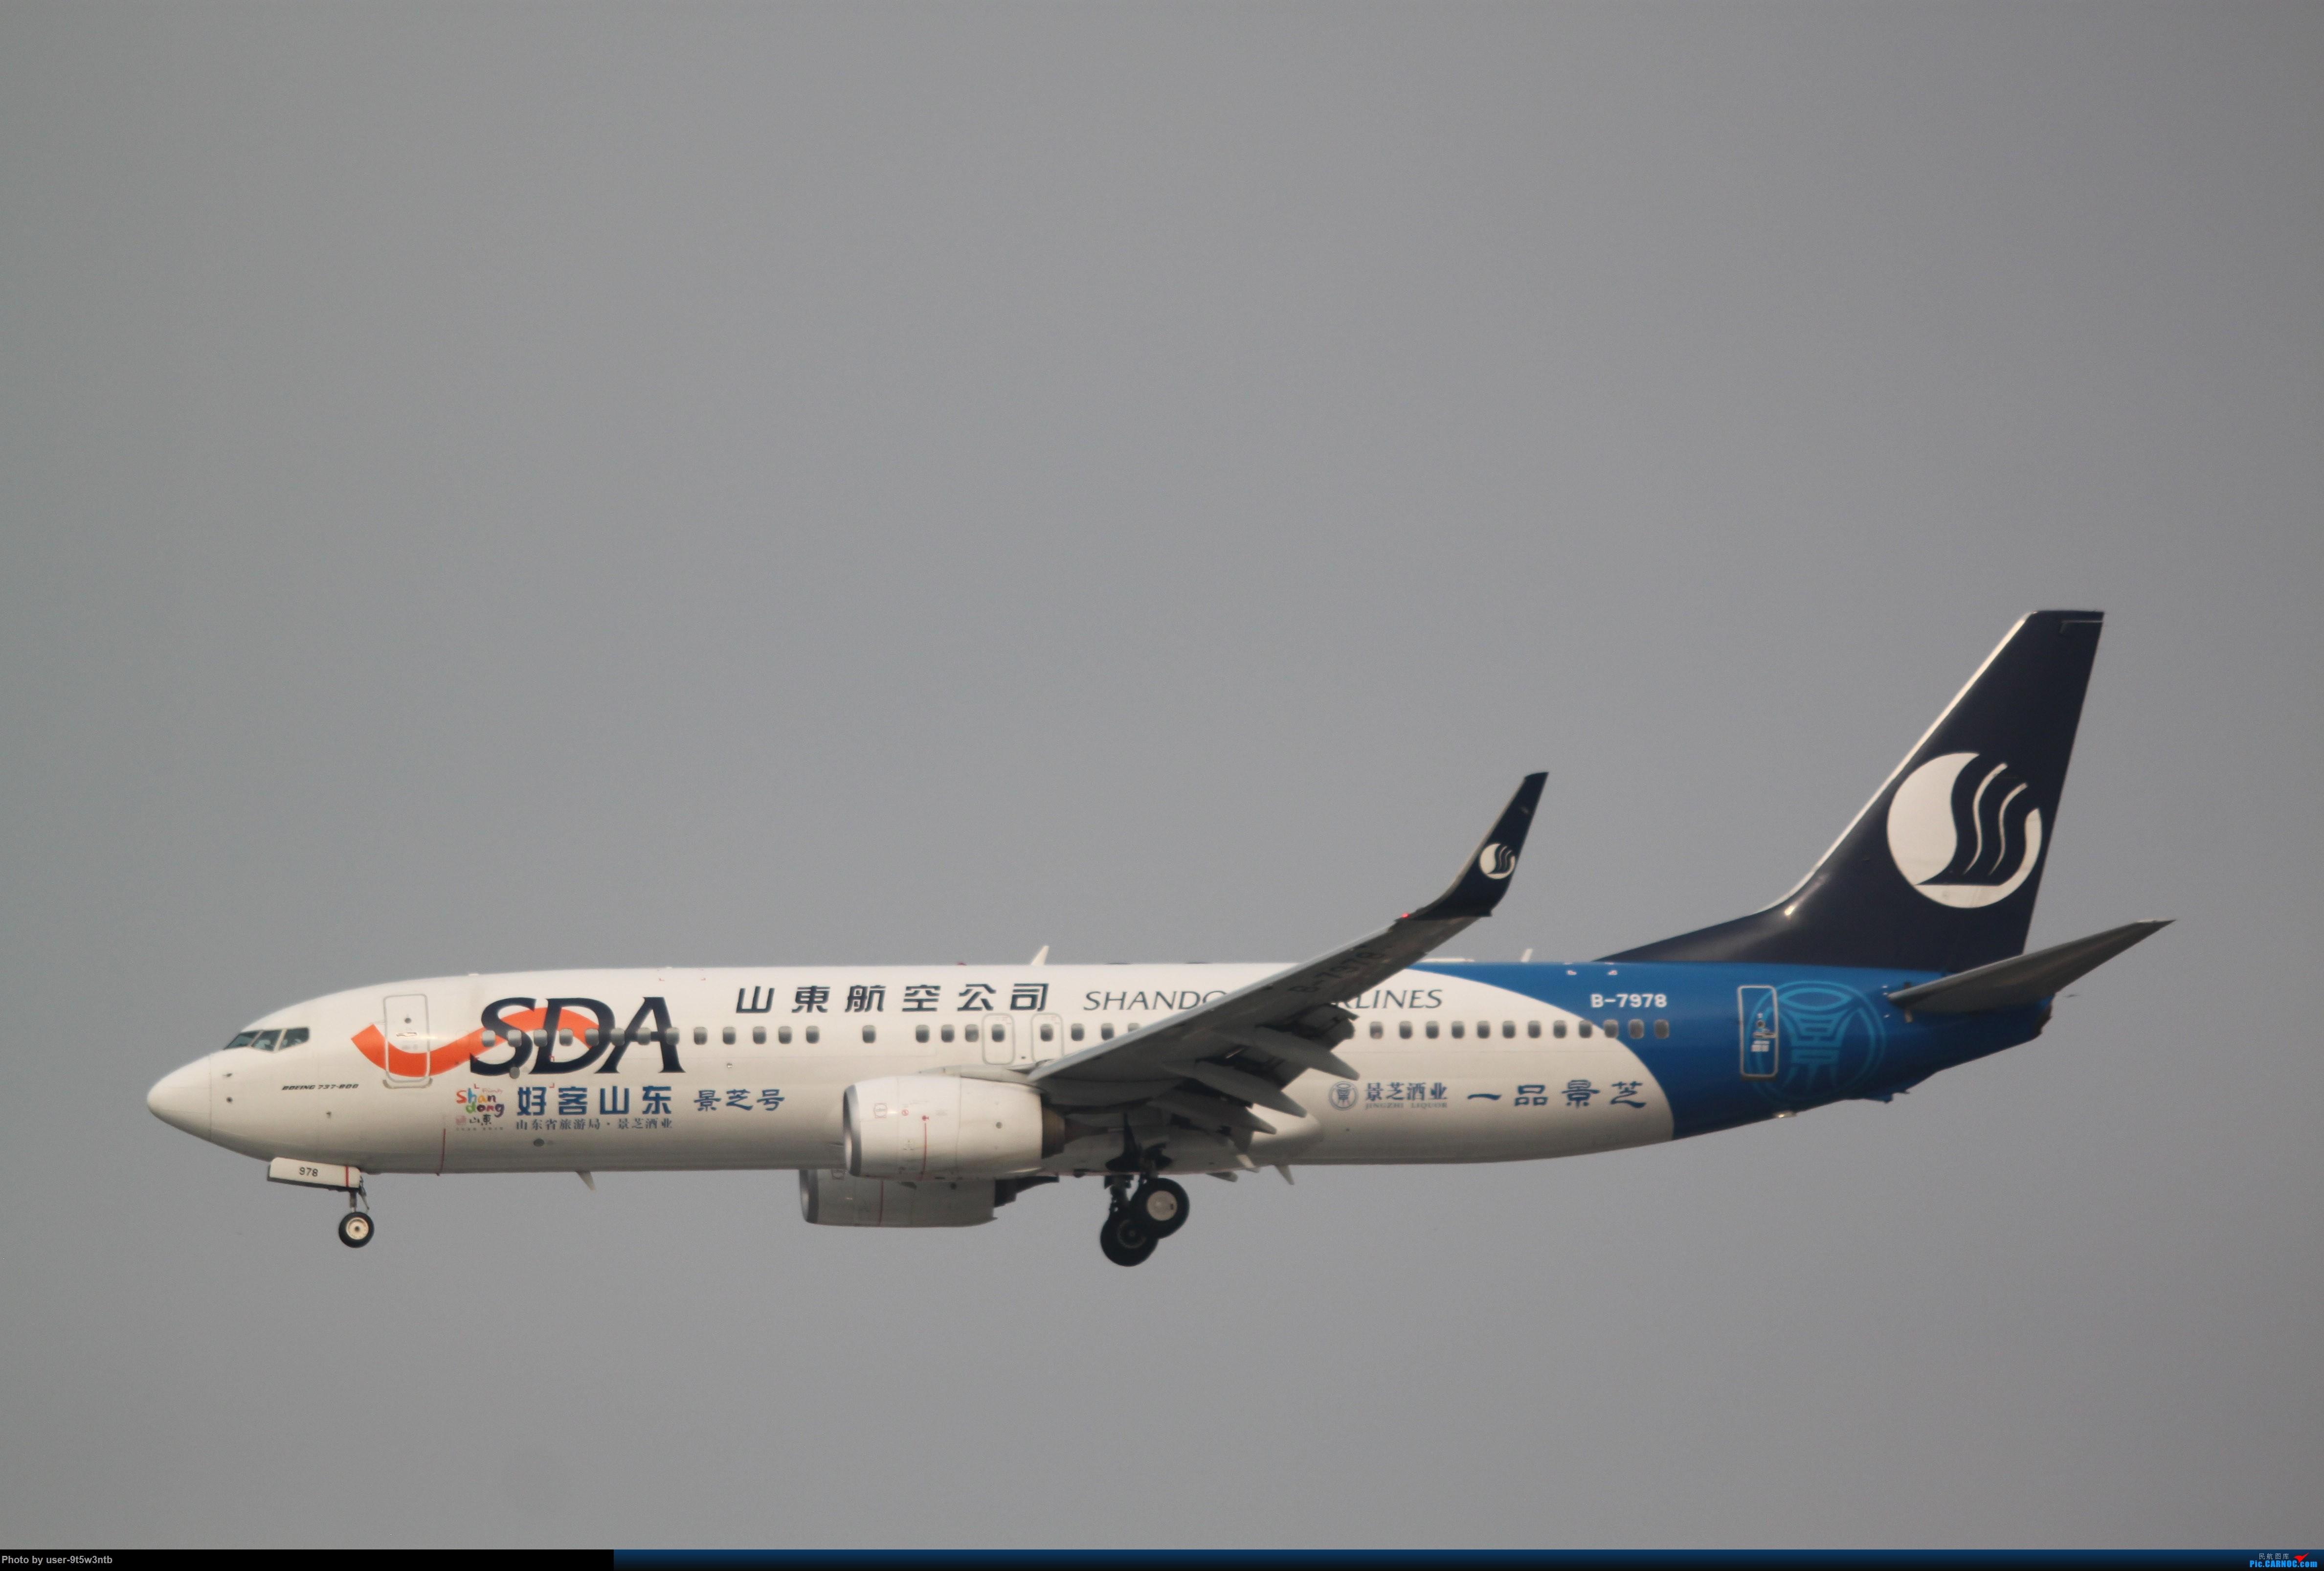 Re:[原创]来整理下最近在虹桥拍到的彩绘机吧~ BOEING 737-800 B-7978 中国上海虹桥国际机场